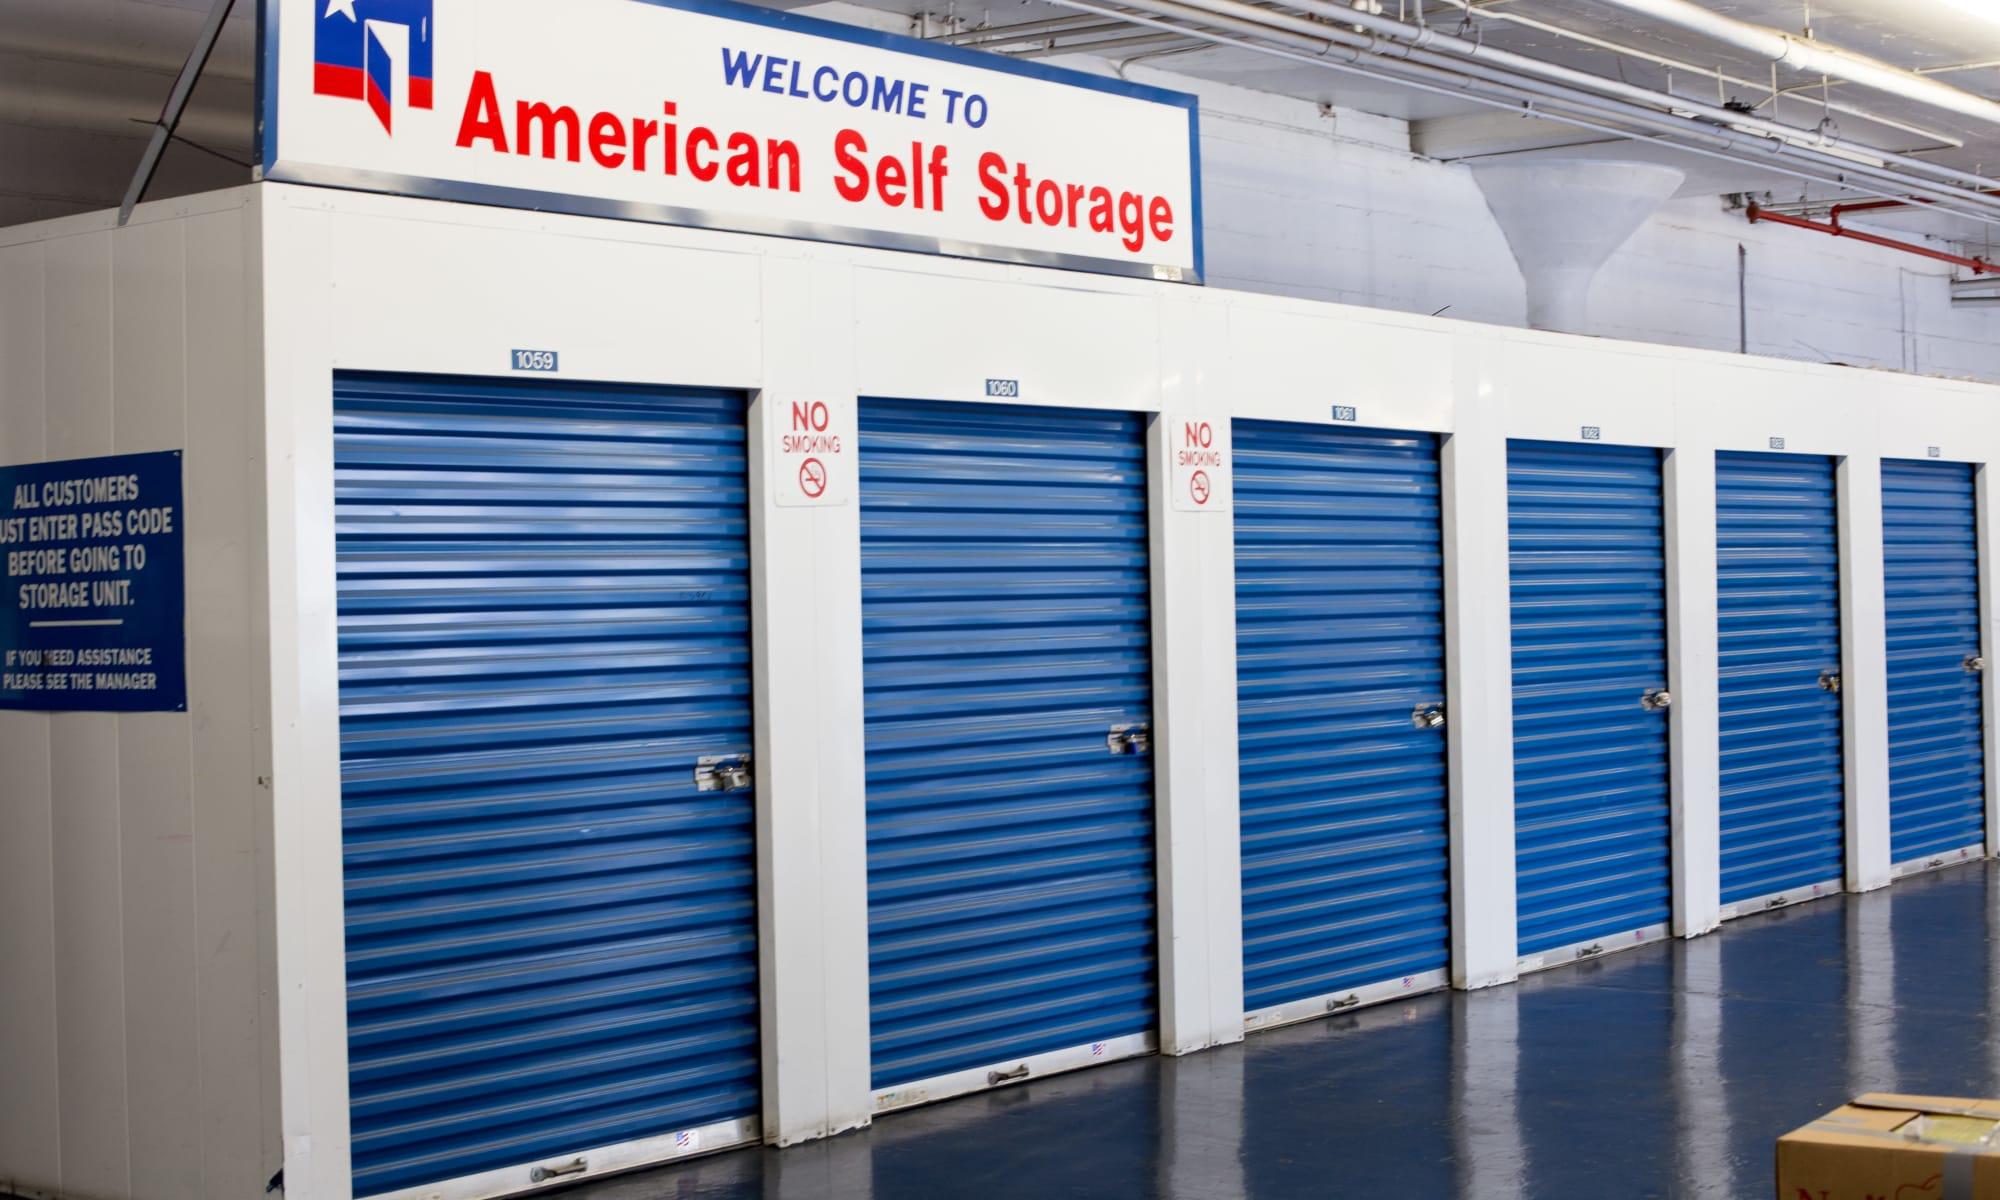 Self storage in Bronx New York